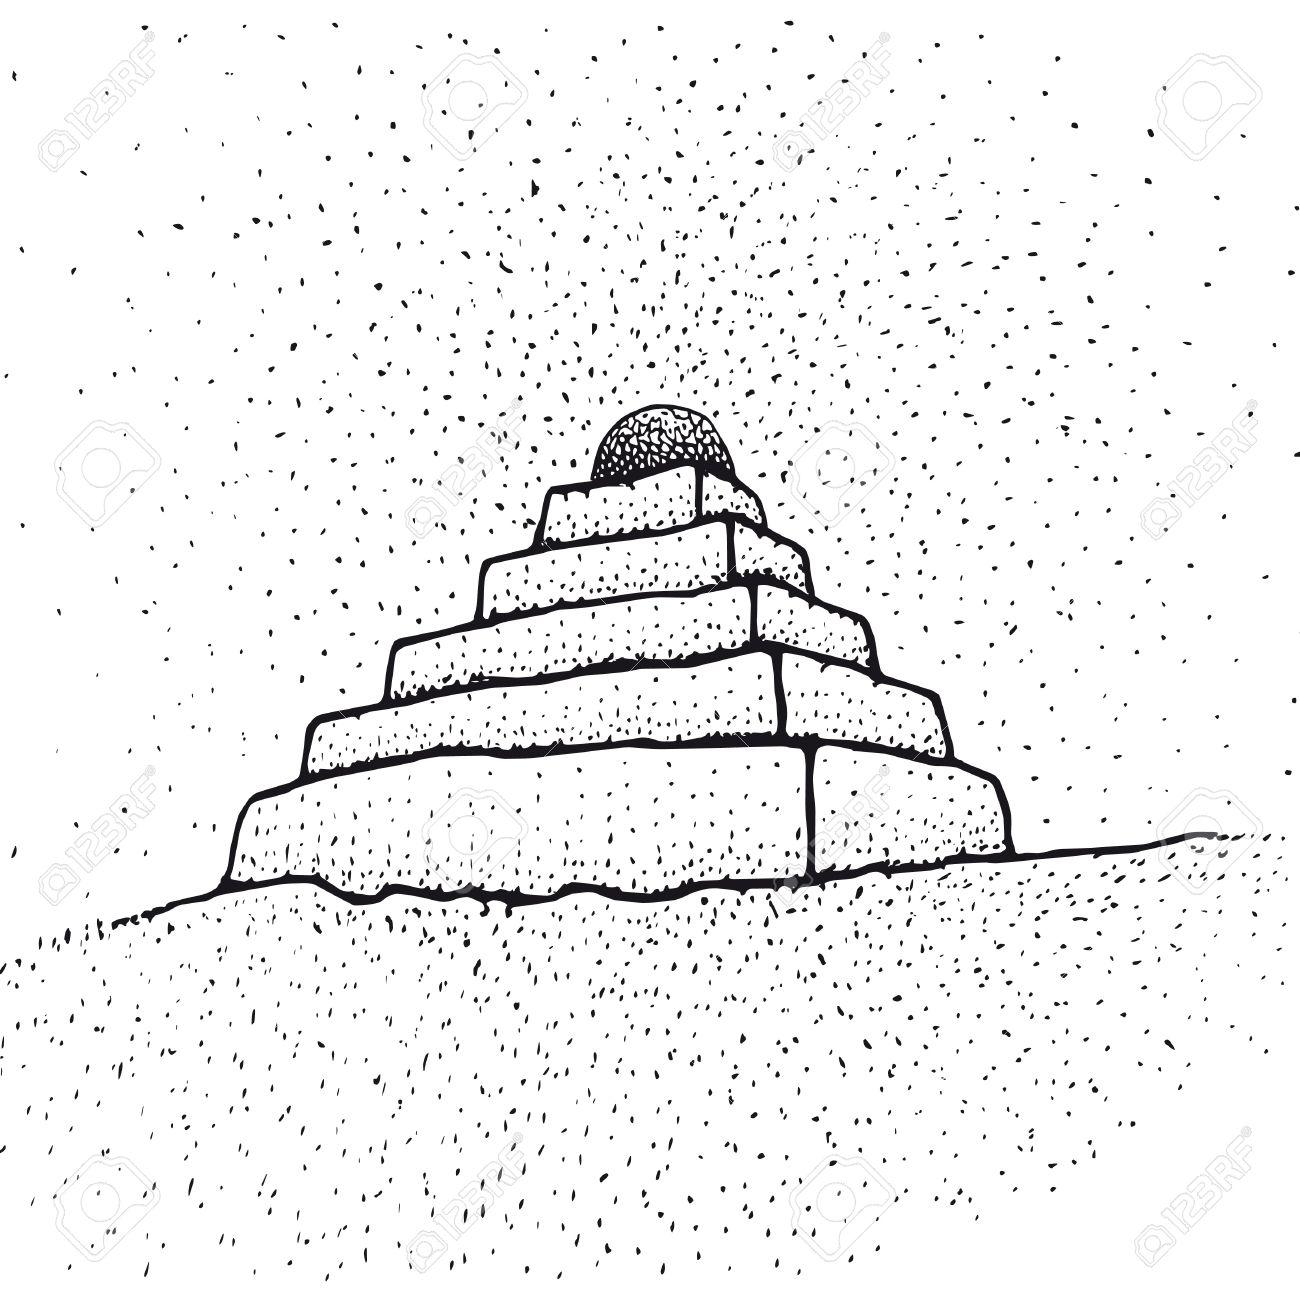 Ziggurat - 10710453